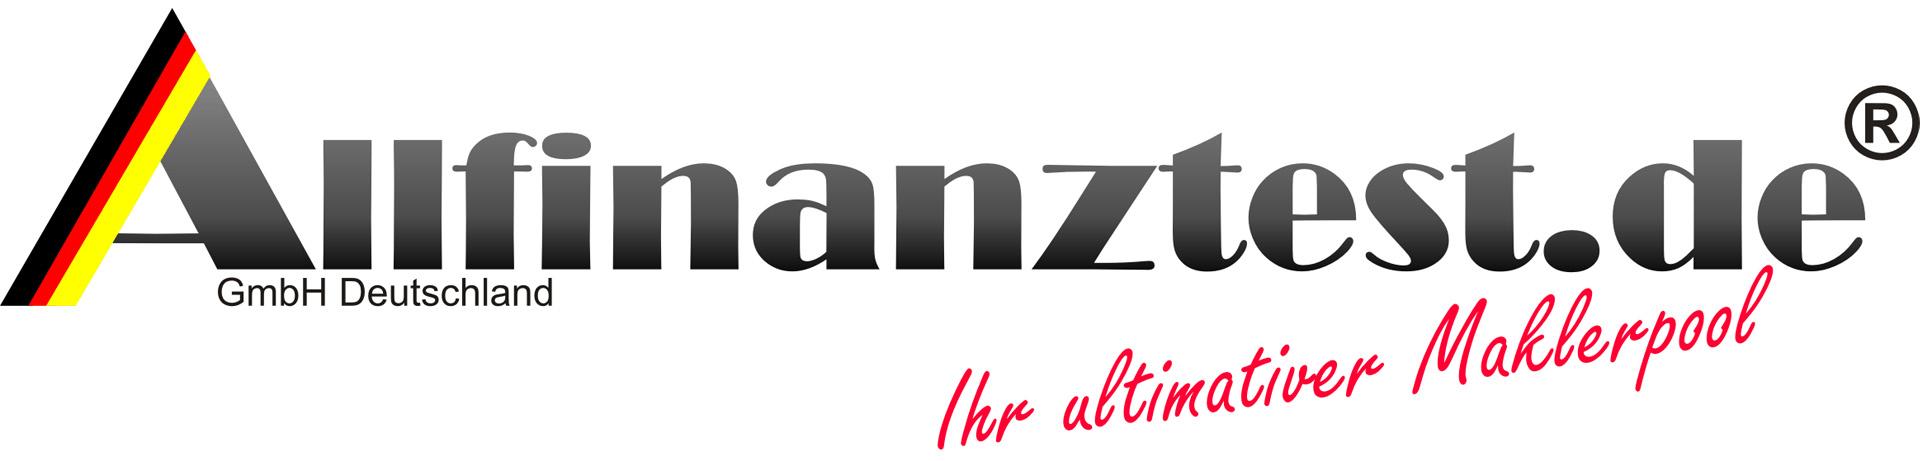 Allfinanztest.de GmbH